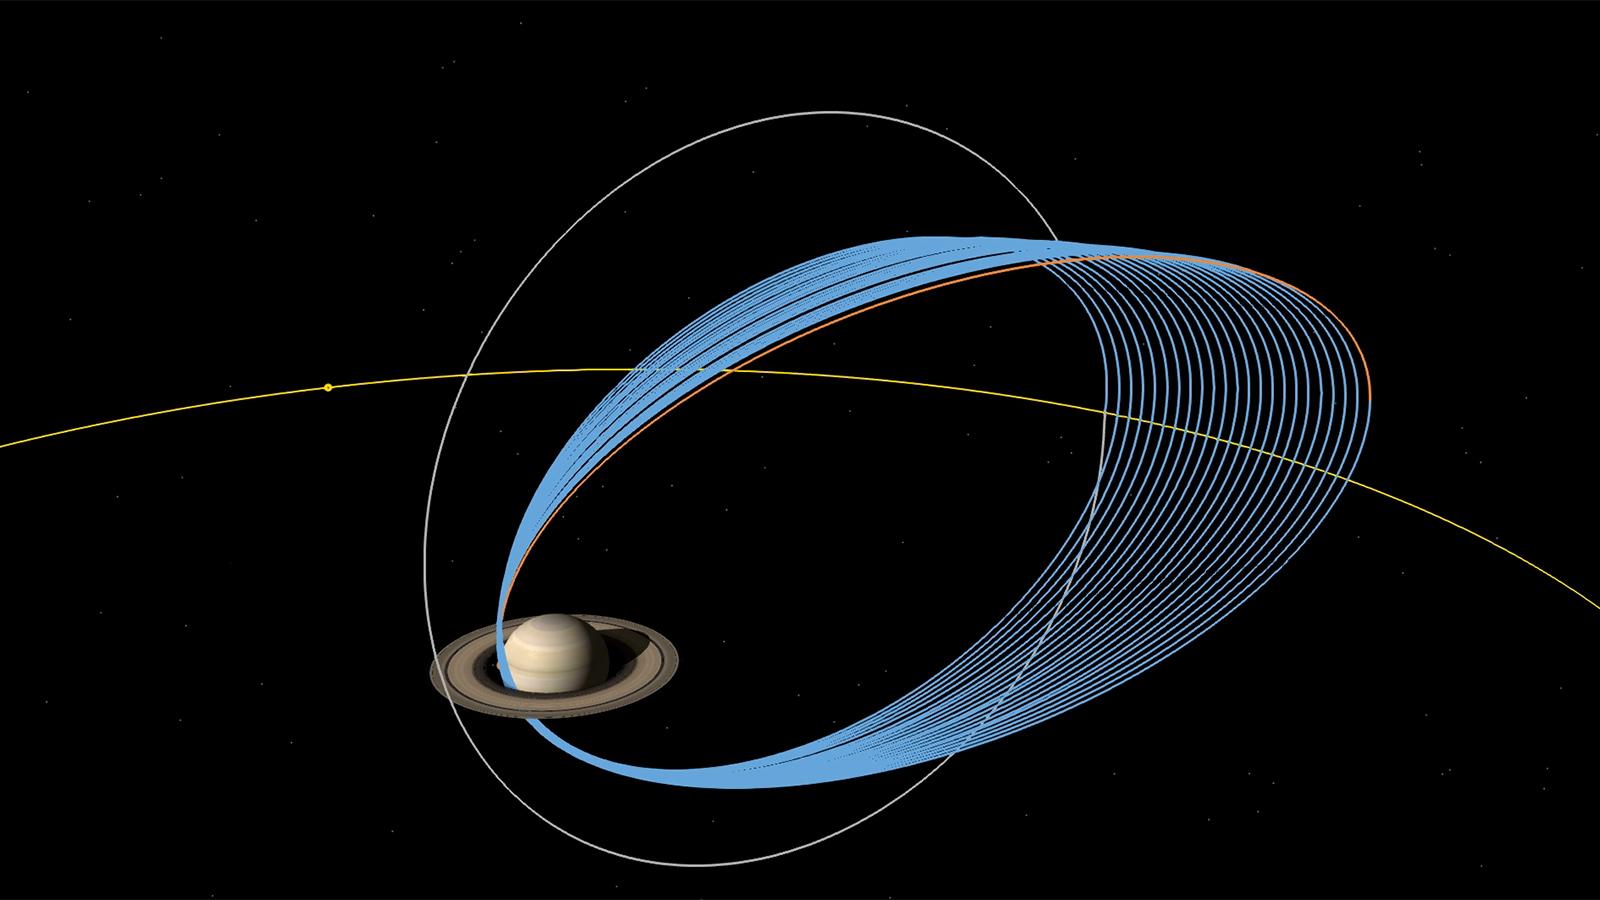 overview cassini nasa solar system exploration - HD1600×900